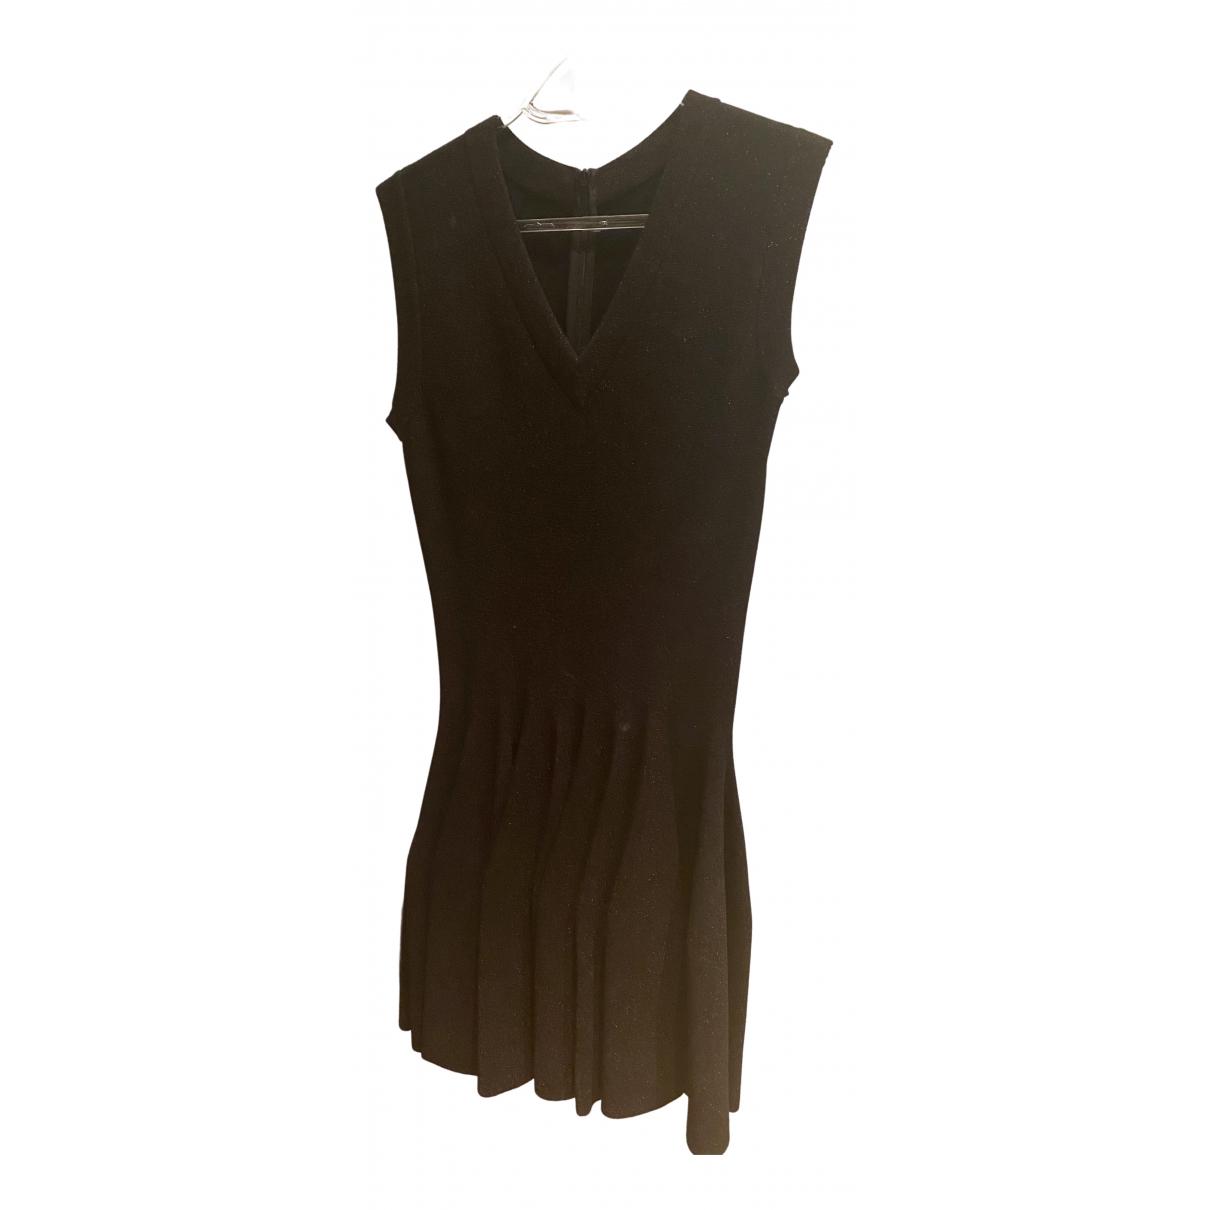 Alaïa \N Brown dress for Women 40 IT